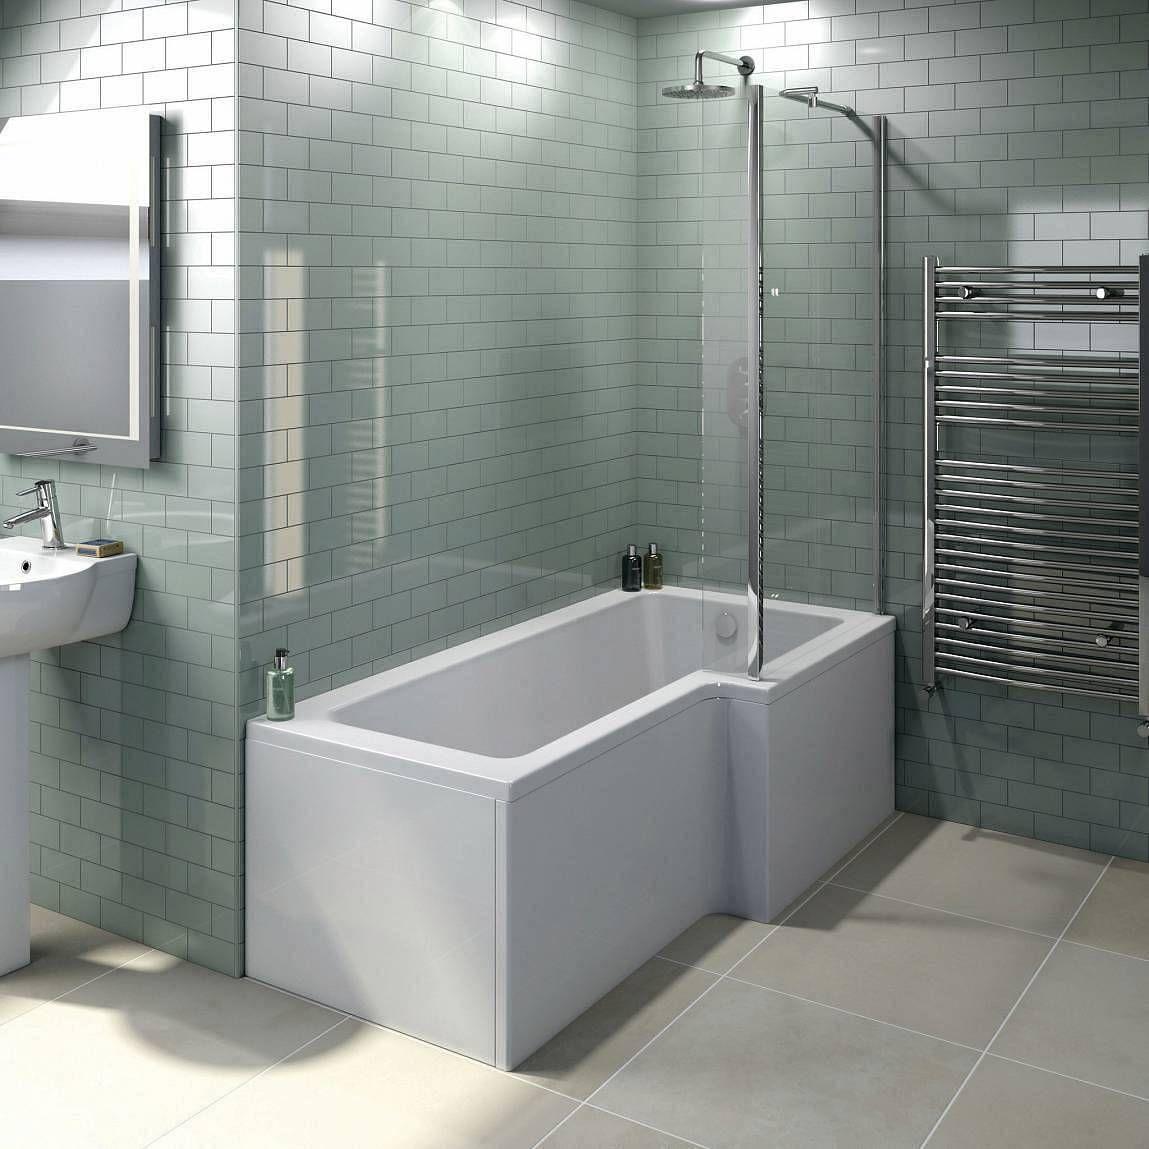 Boston+Shower+Bath+1700+x+850+RH+inc.+Screen | soft white decor ...